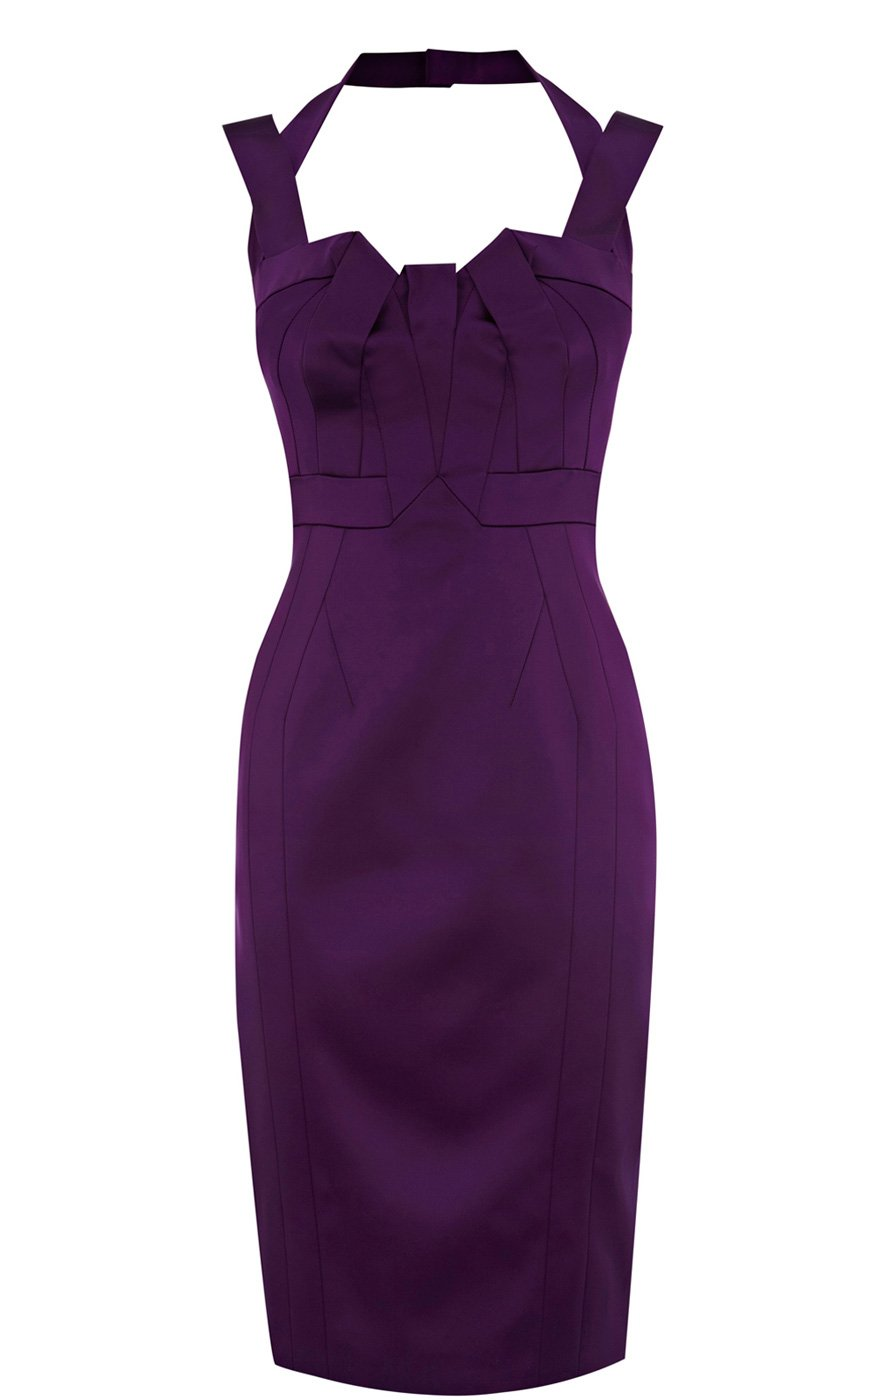 Karen millen Signature Stretch Satin Dress in Purple